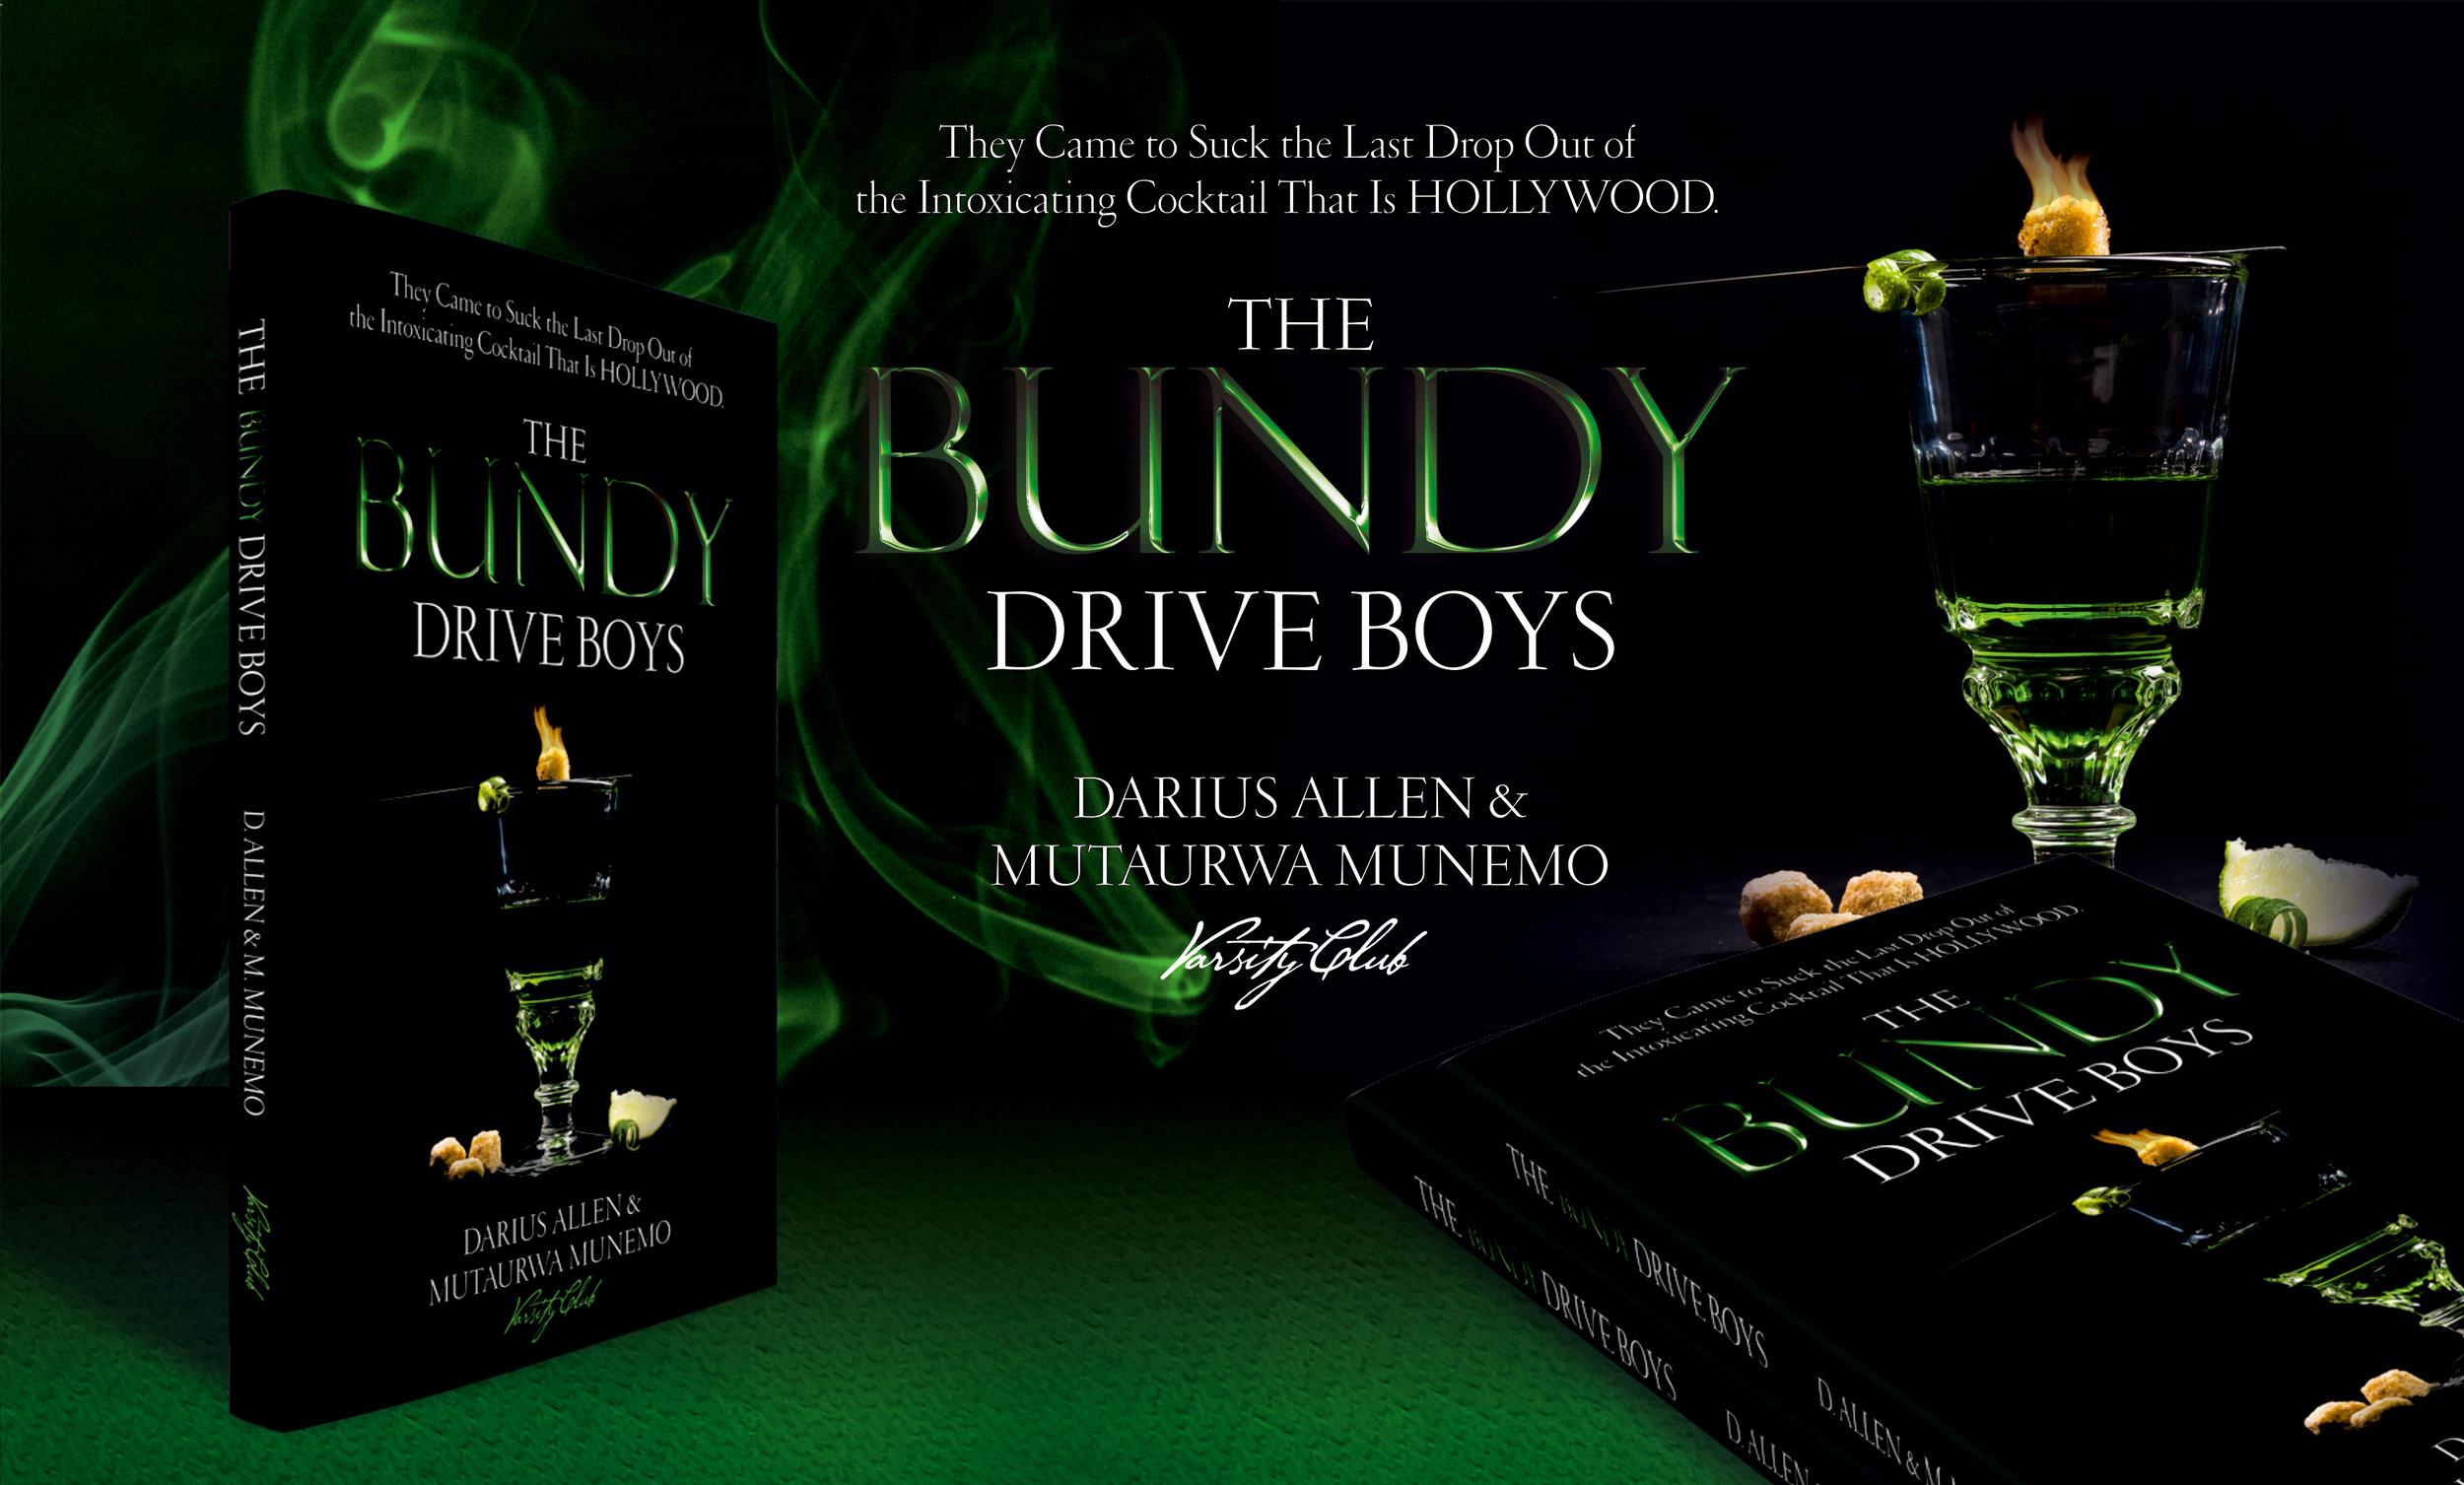 The_Bundy_Drive_Boys_3d_new (2).jpg